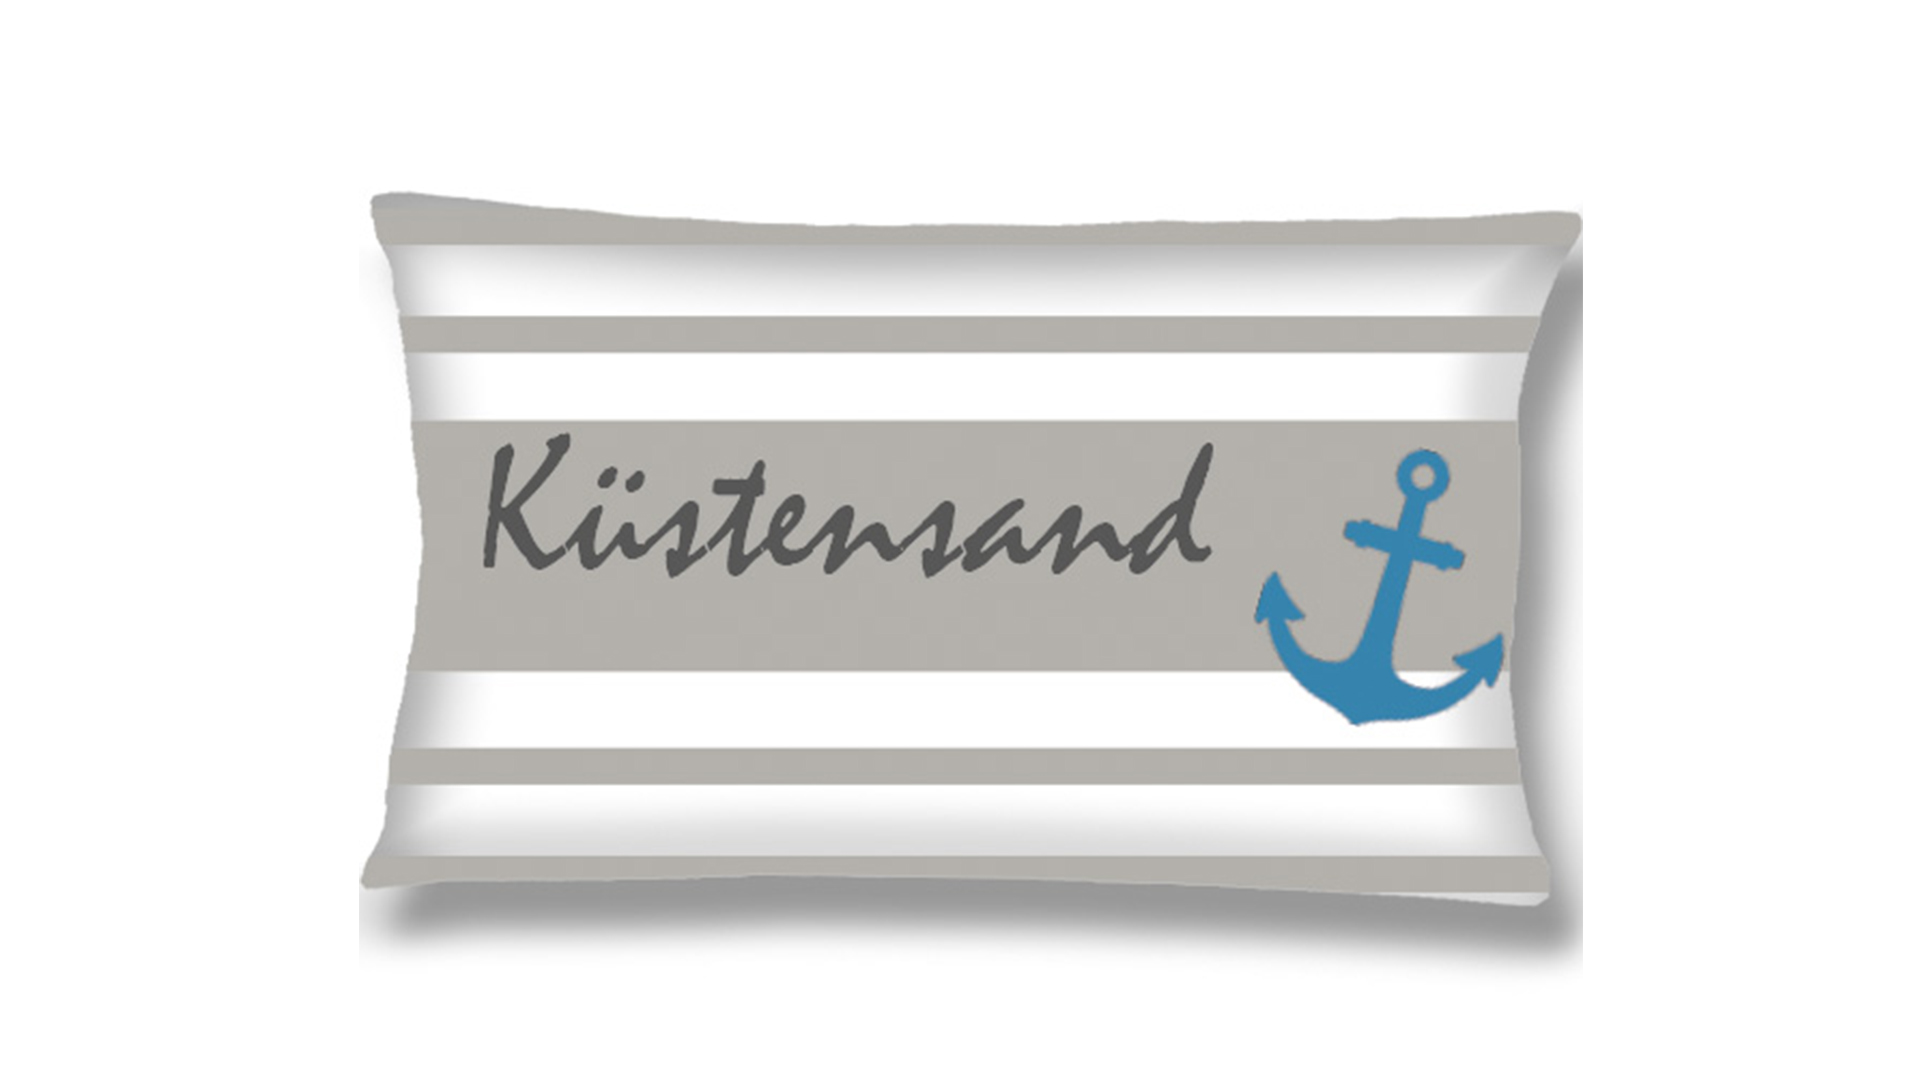 kissen zierkissen maritime ahoi 30 x 50 kbt. Black Bedroom Furniture Sets. Home Design Ideas